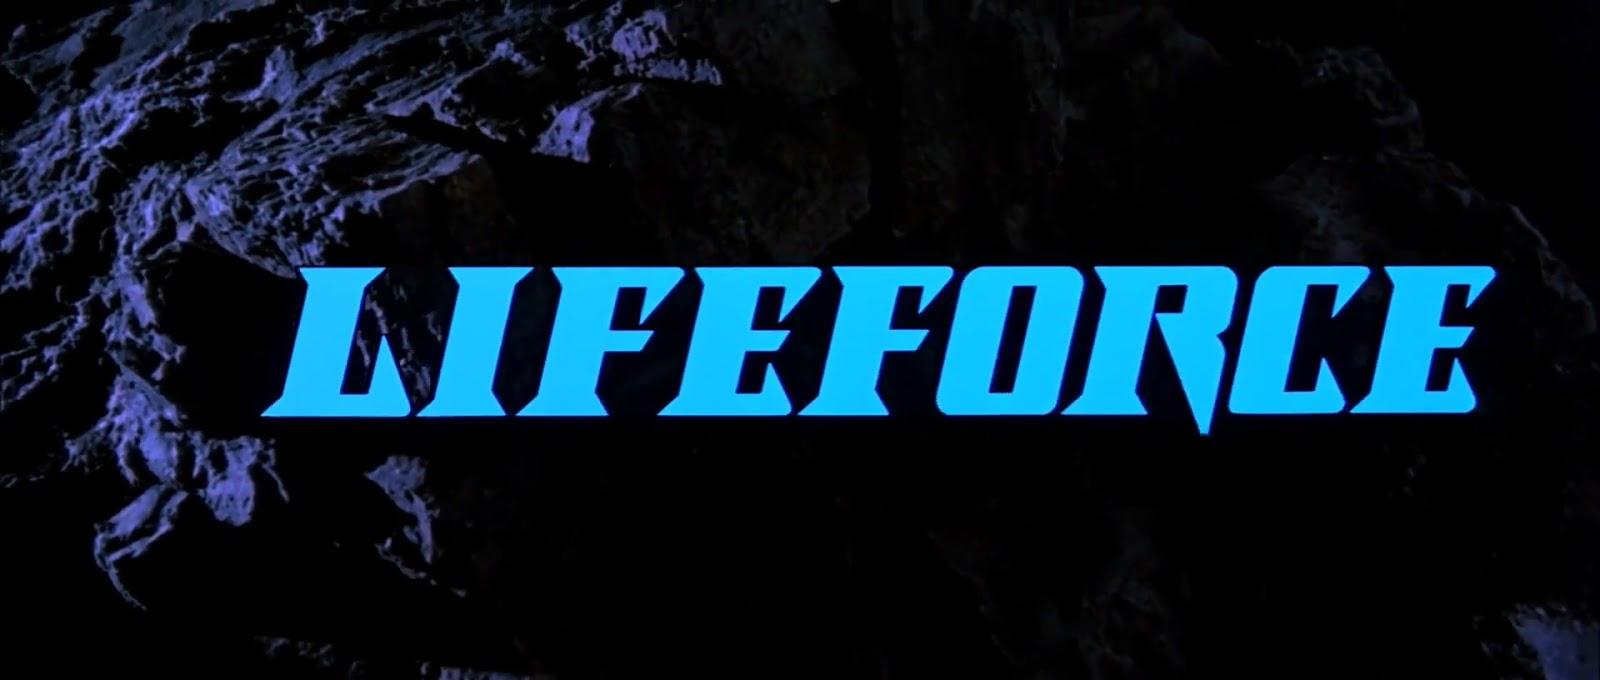 LIFEFORCE : L'ÉTOILE DU MAL (Lifeforce) de Tobe Hooper (1985)